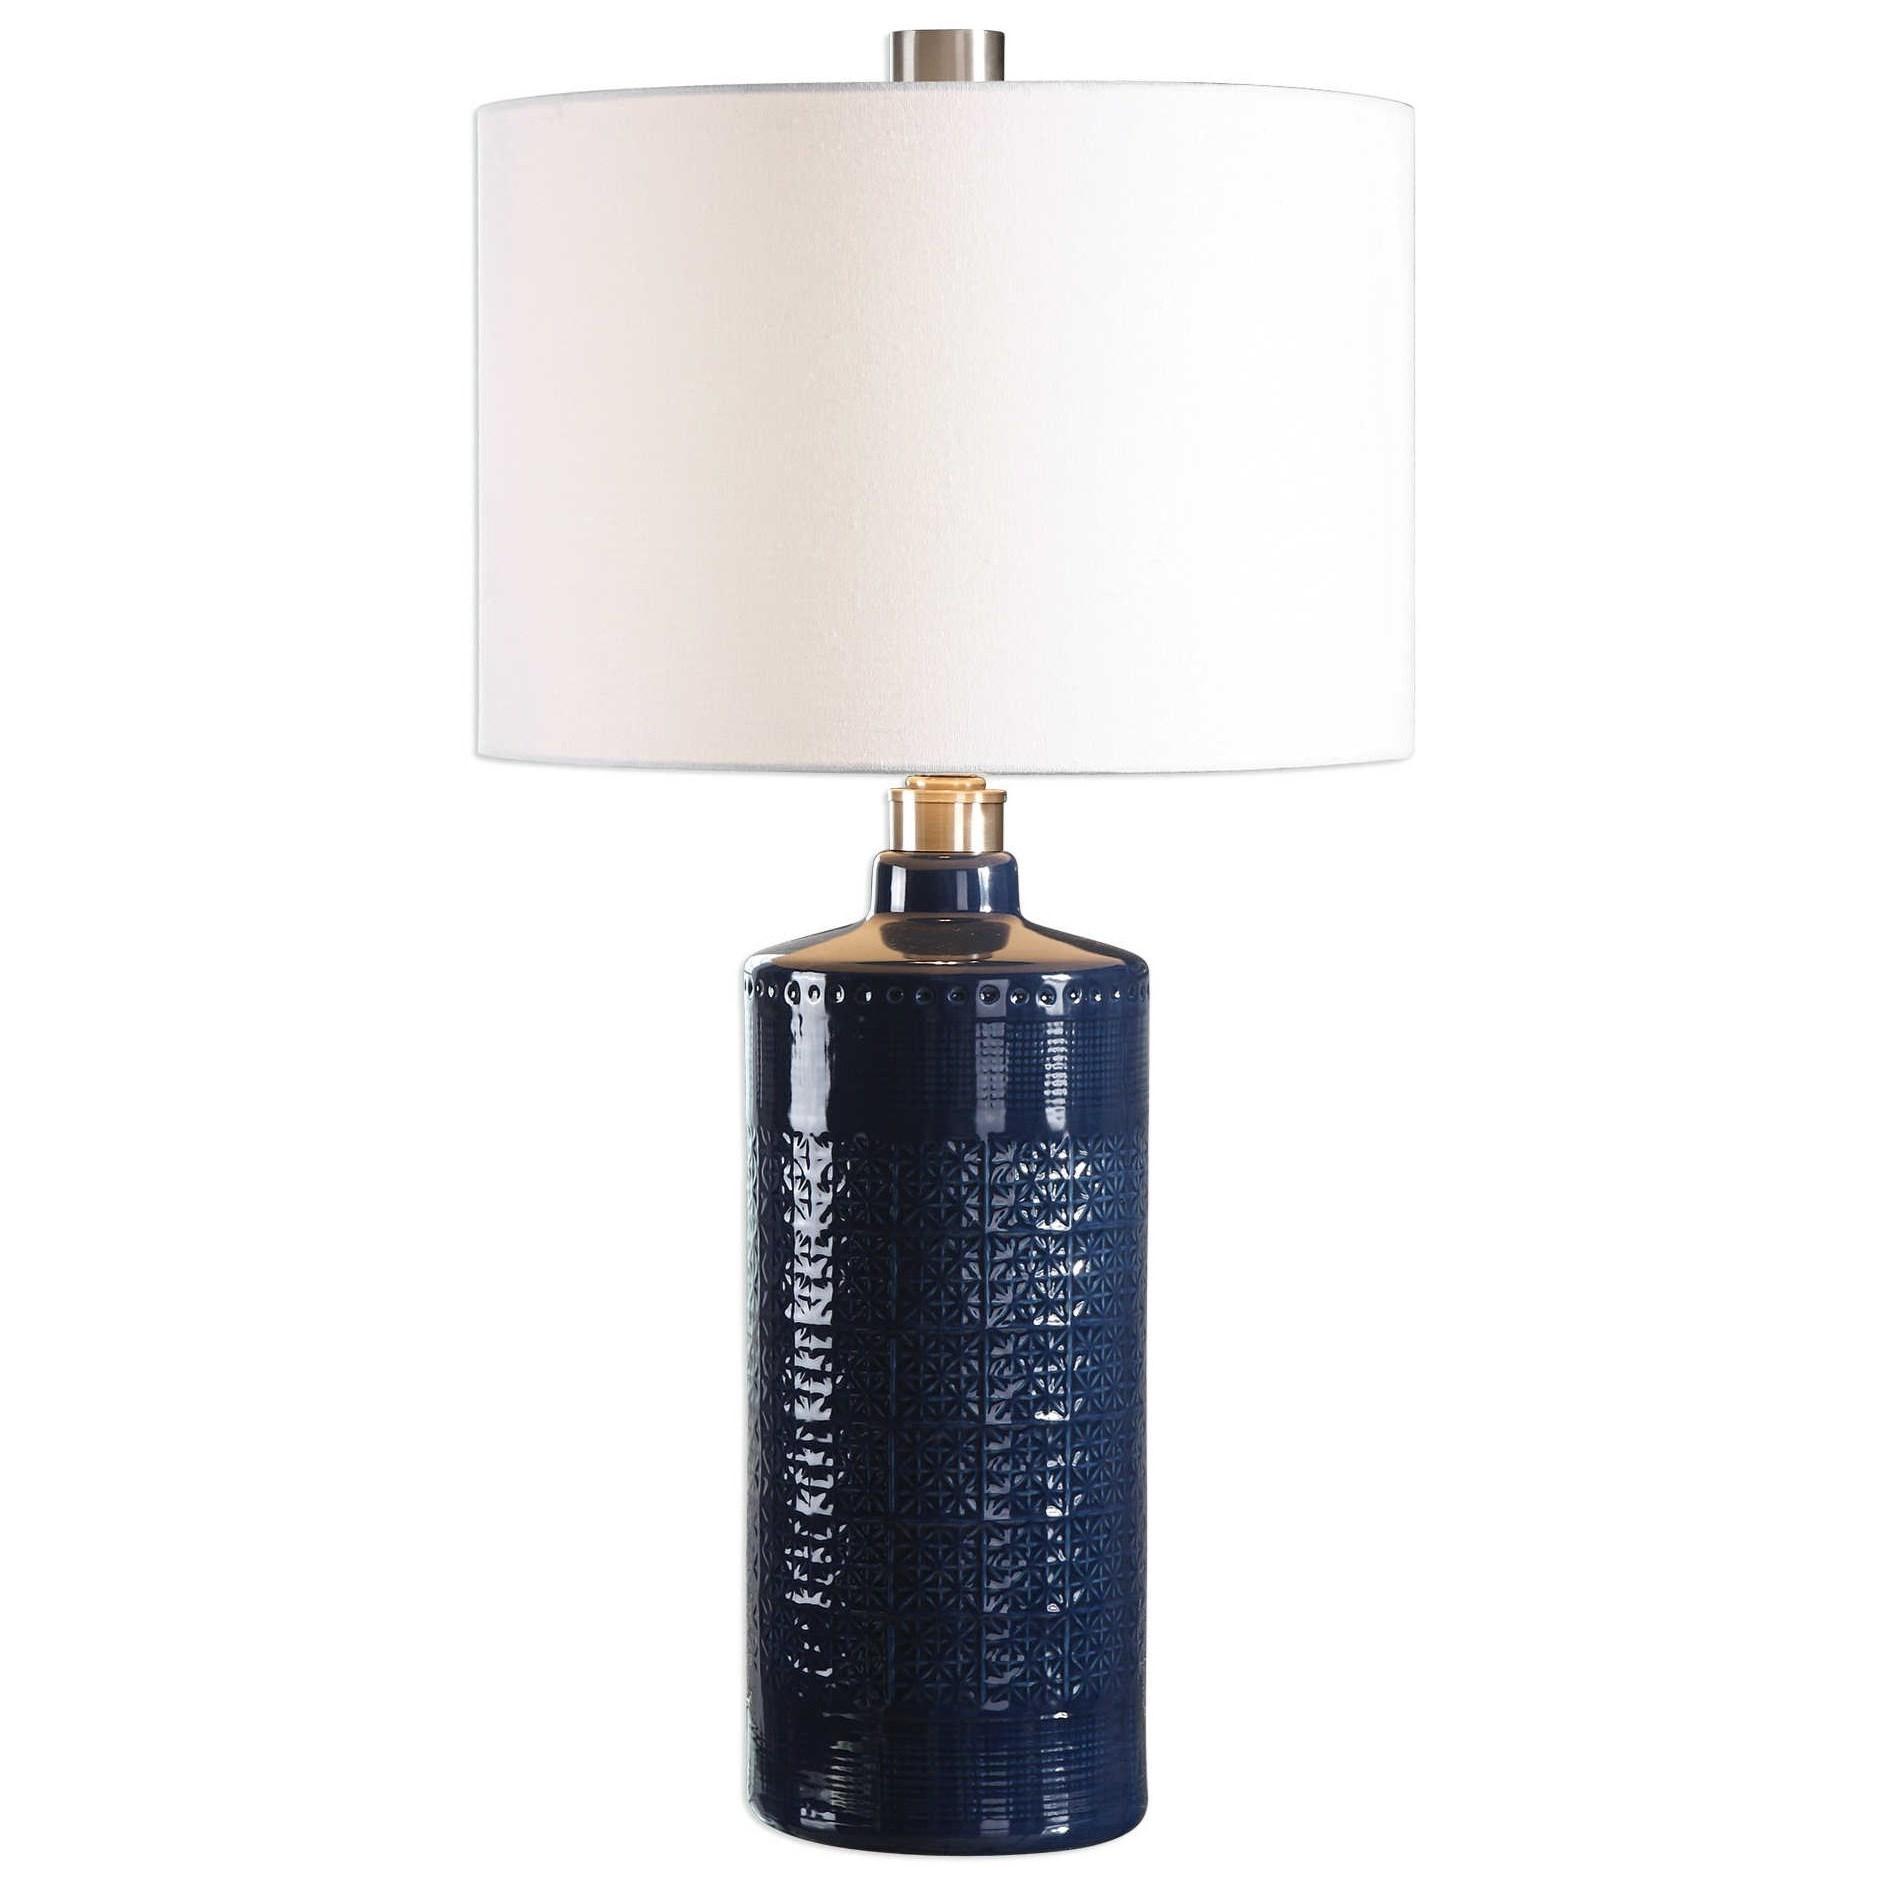 Table Lamps Thalia Royal Blue Table Lamp at Ruby Gordon Home